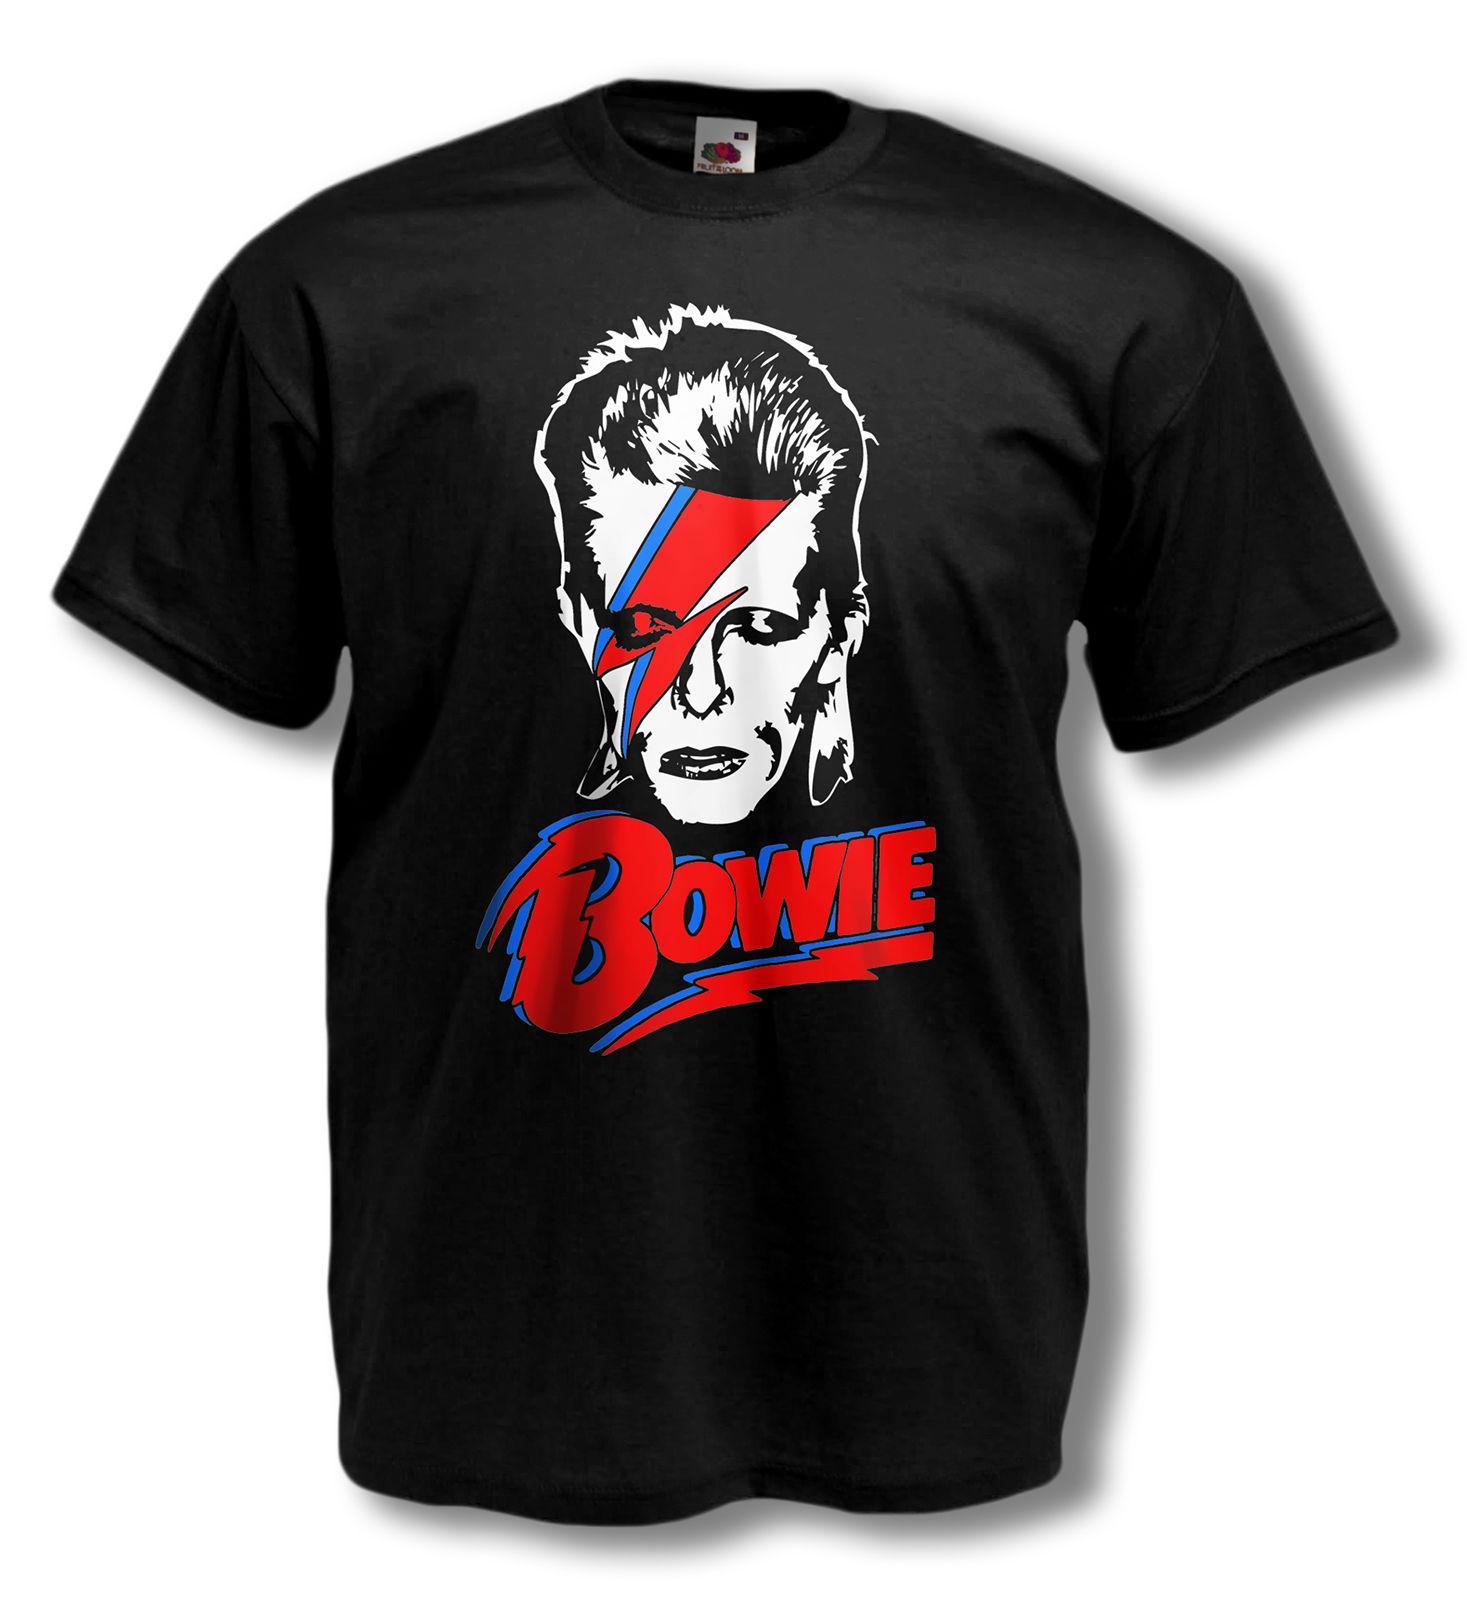 David Bowie T-shirt ALADDIN SANE bowie tribute tshirt JEAN GENIE mens ALL SIZES